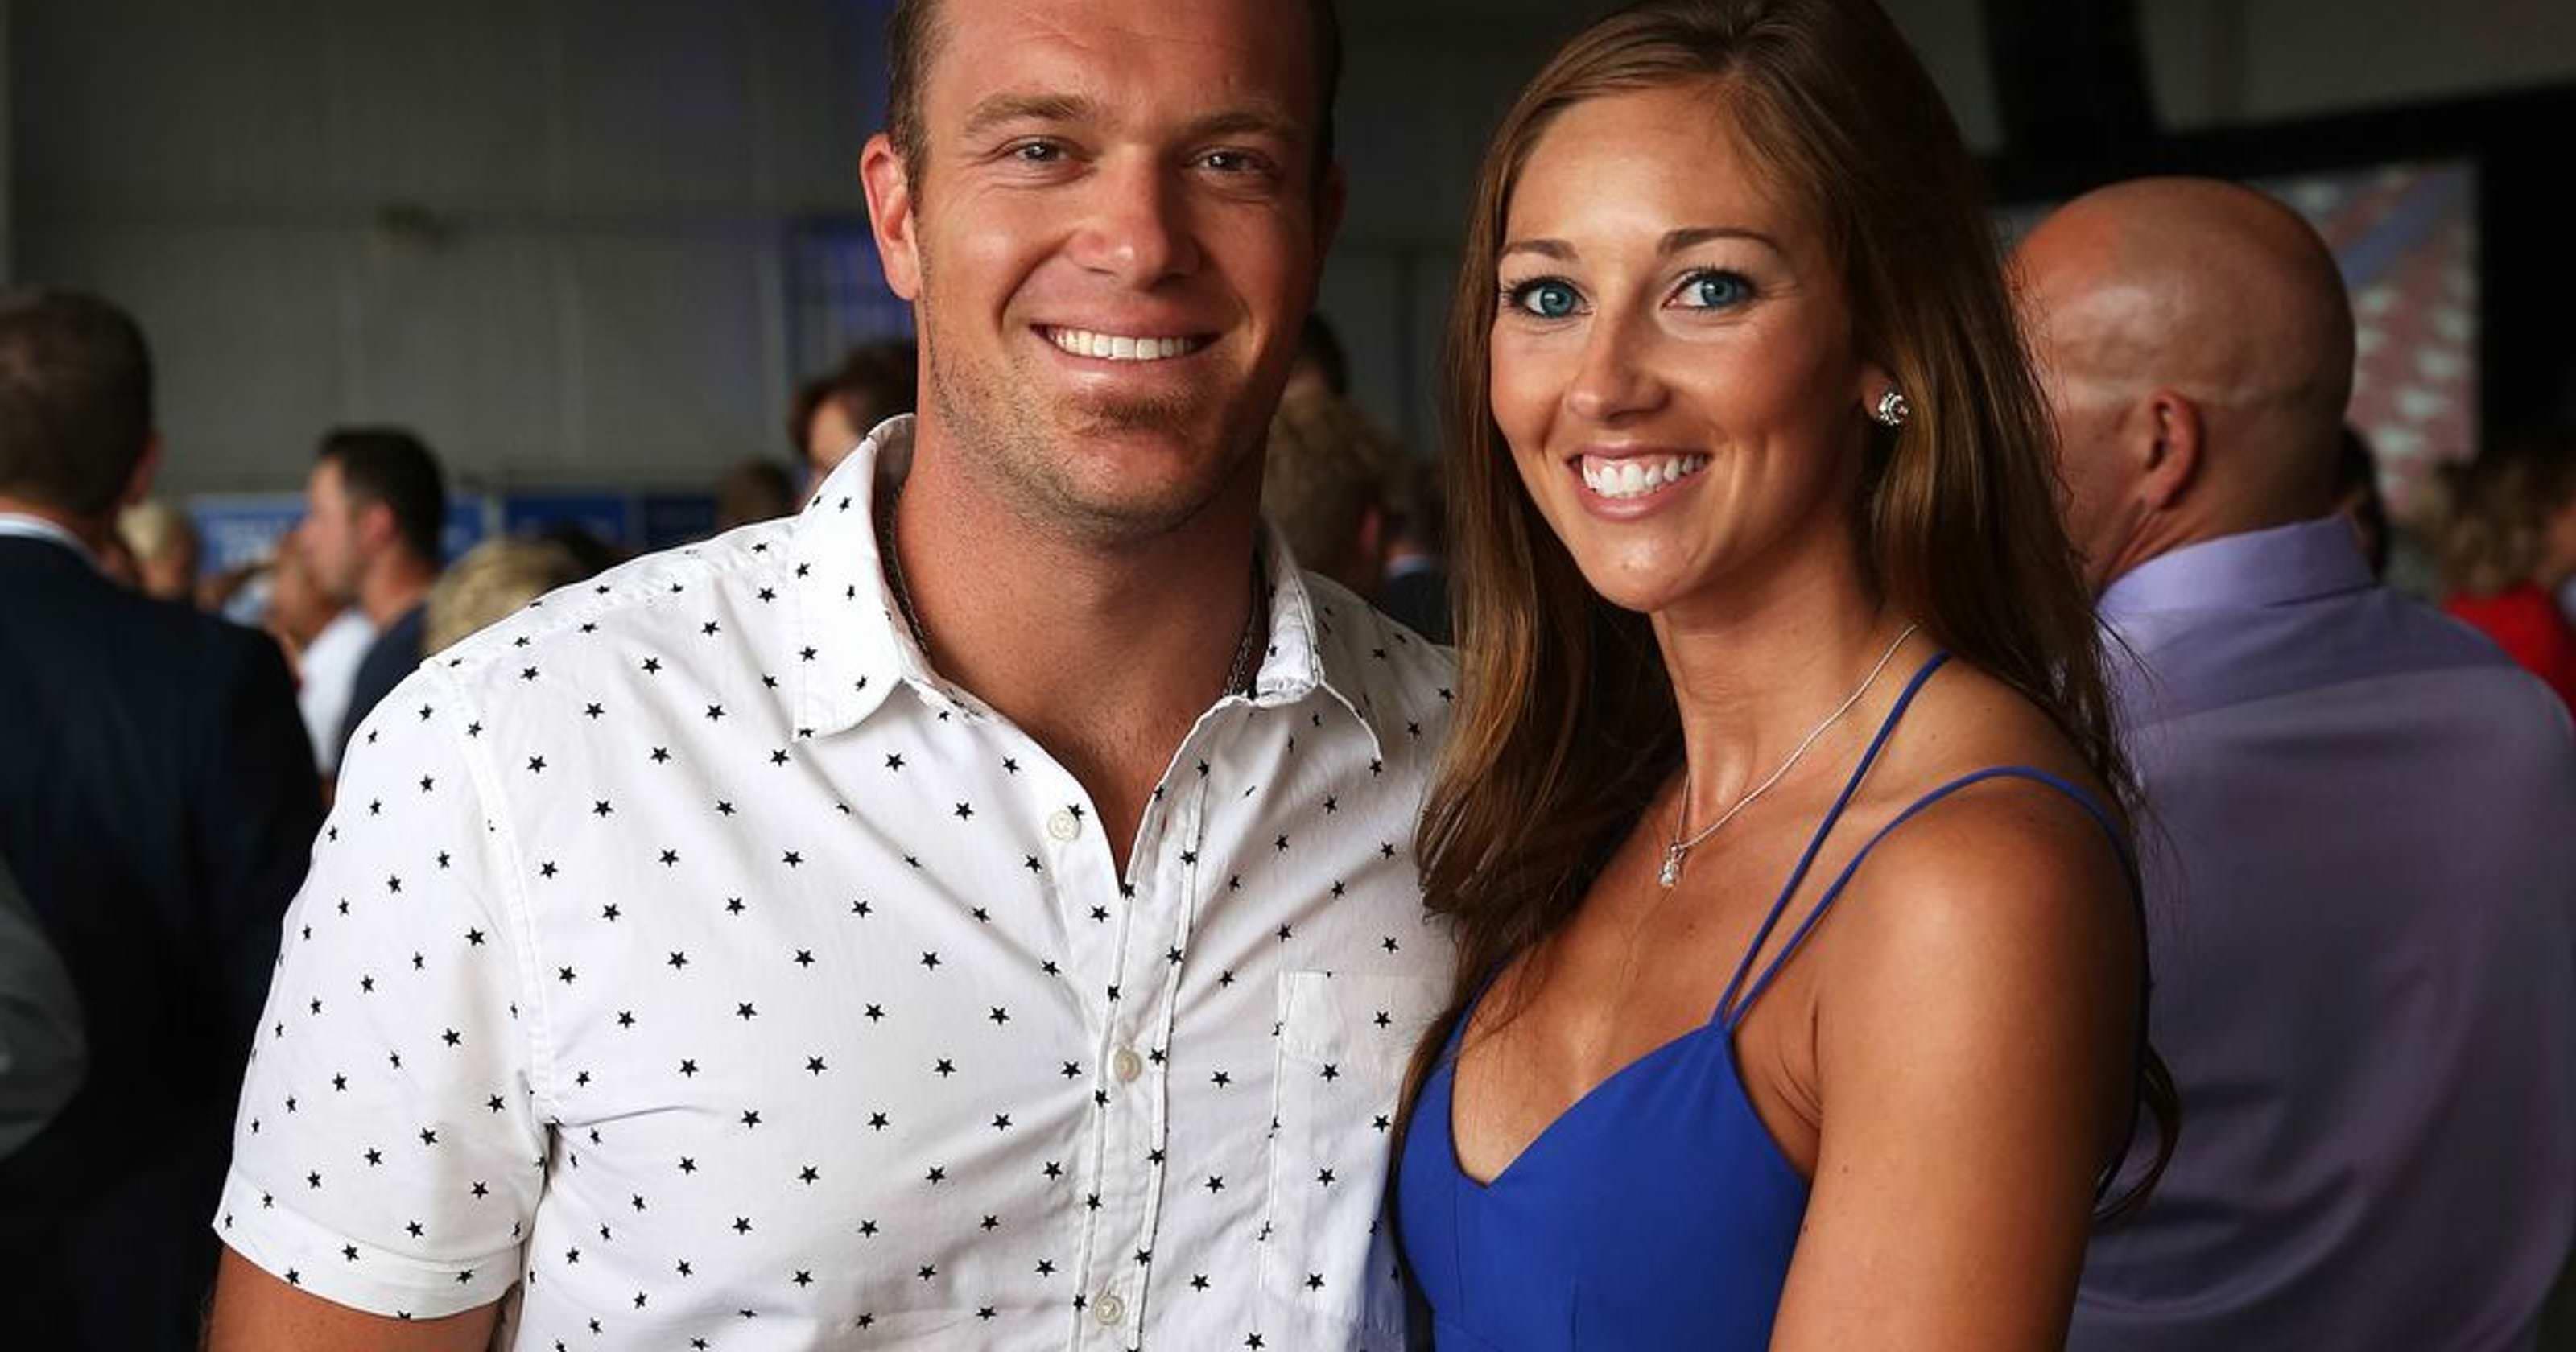 O ex-jogador do Colts, Matt Overton, contratou a ex-líder de torcida do Colts, Breanna Fonner